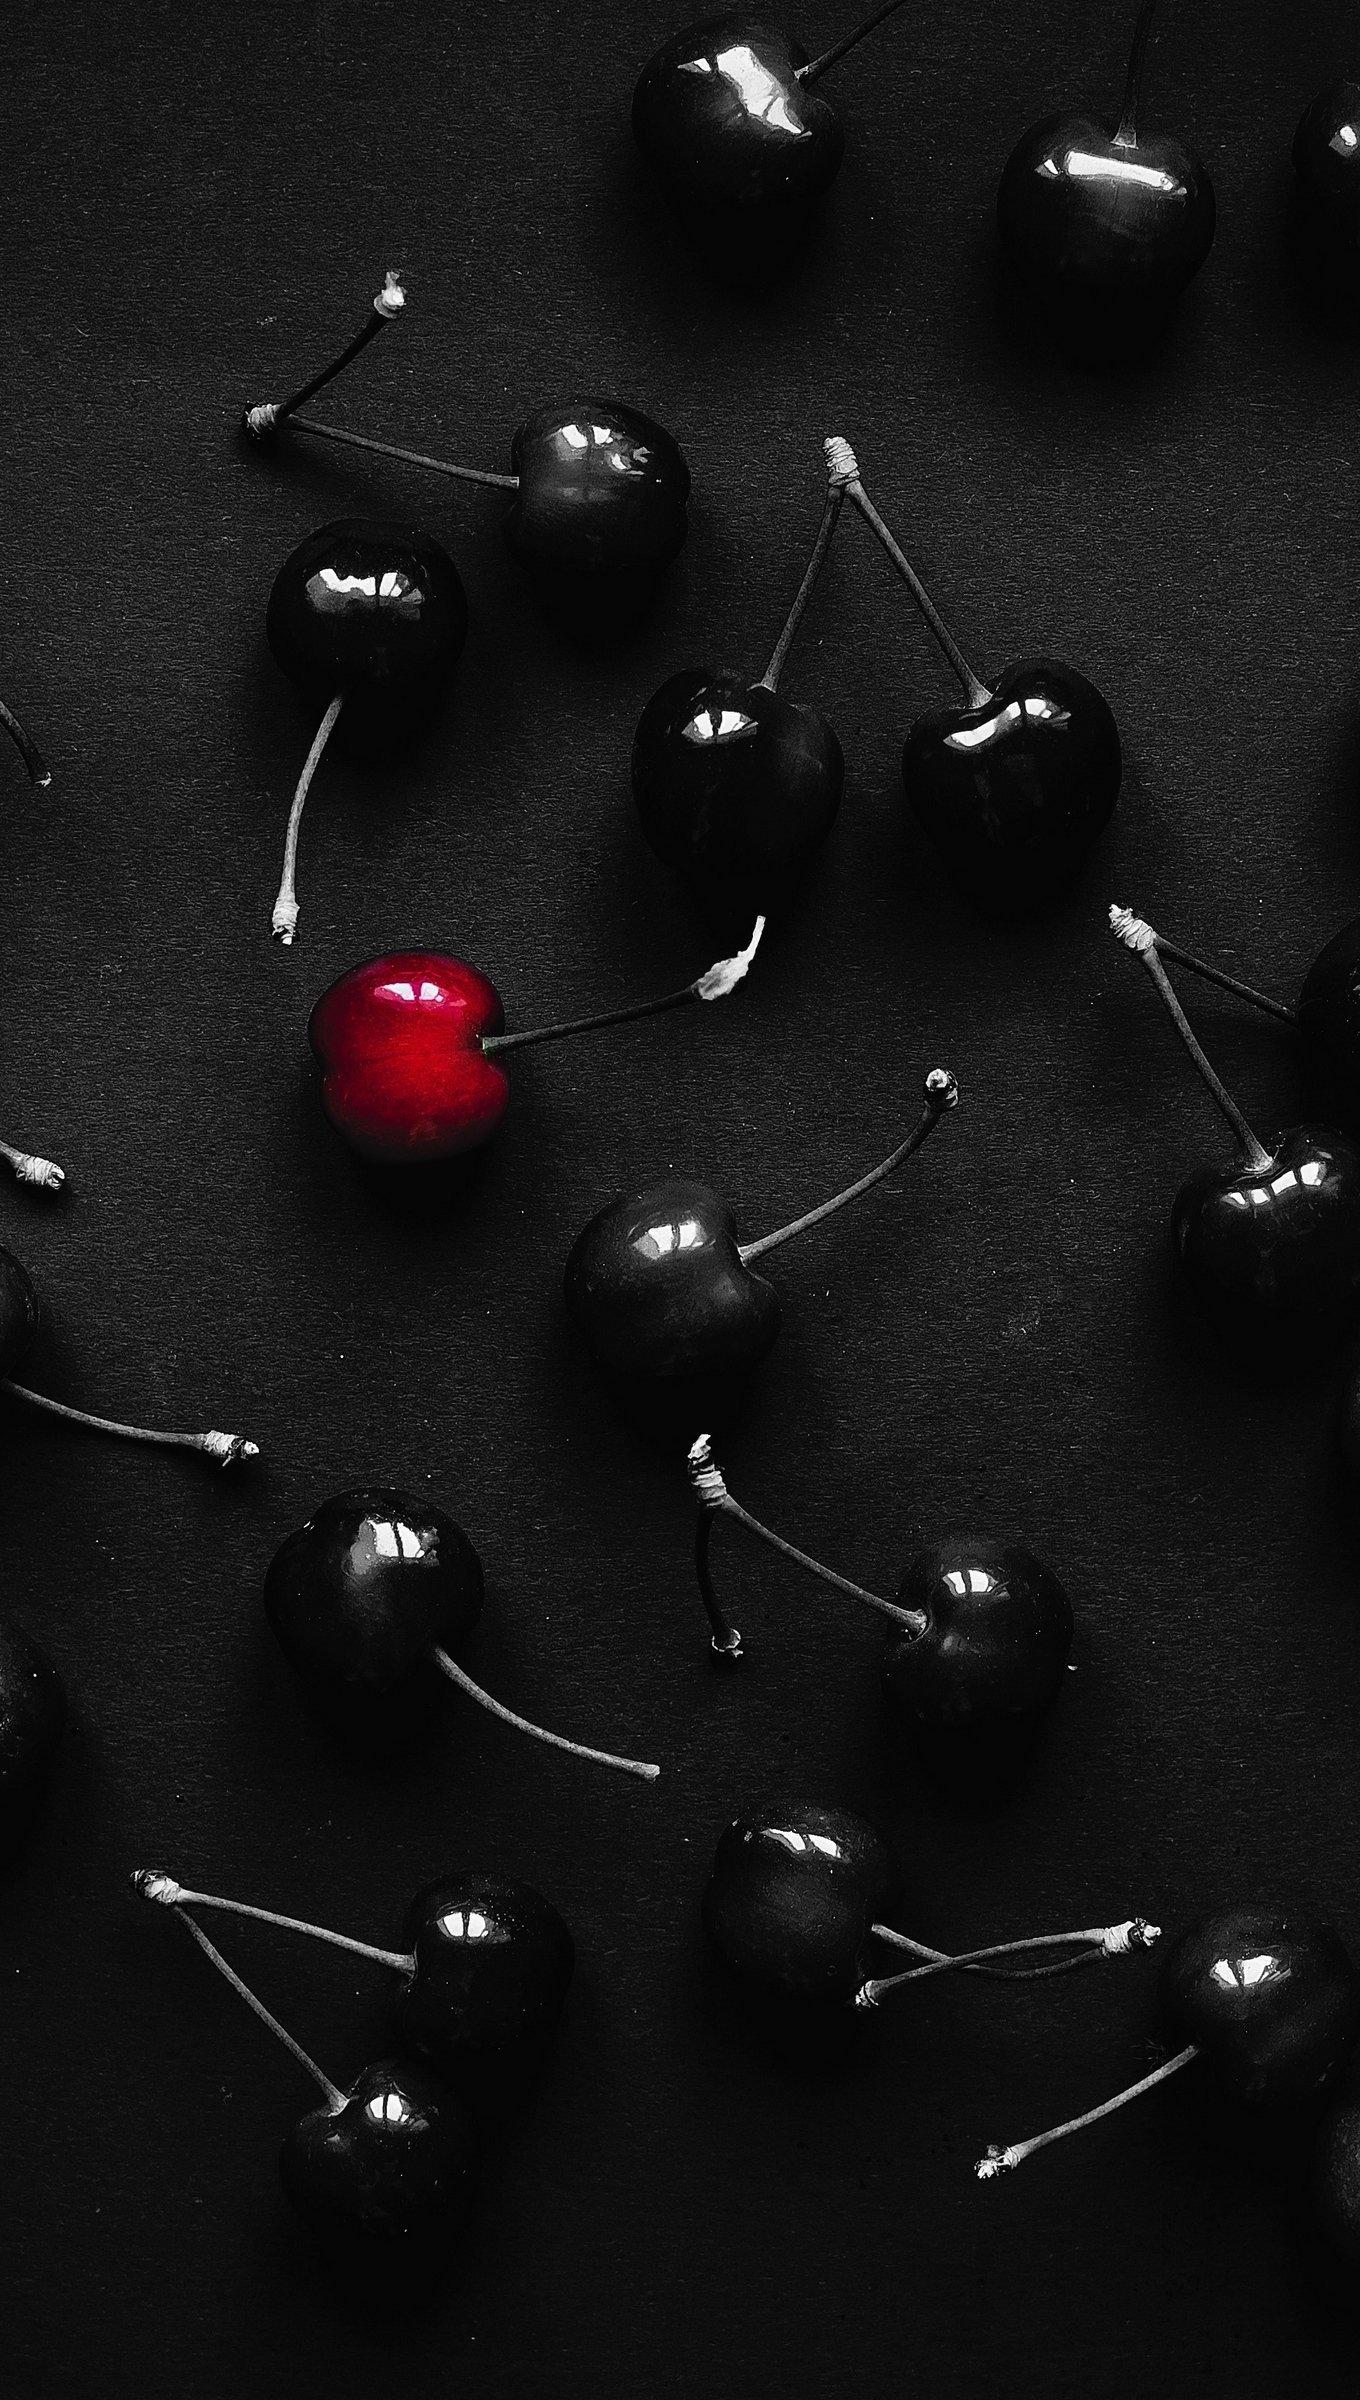 Wallpaper Black cherries and red cherry Vertical